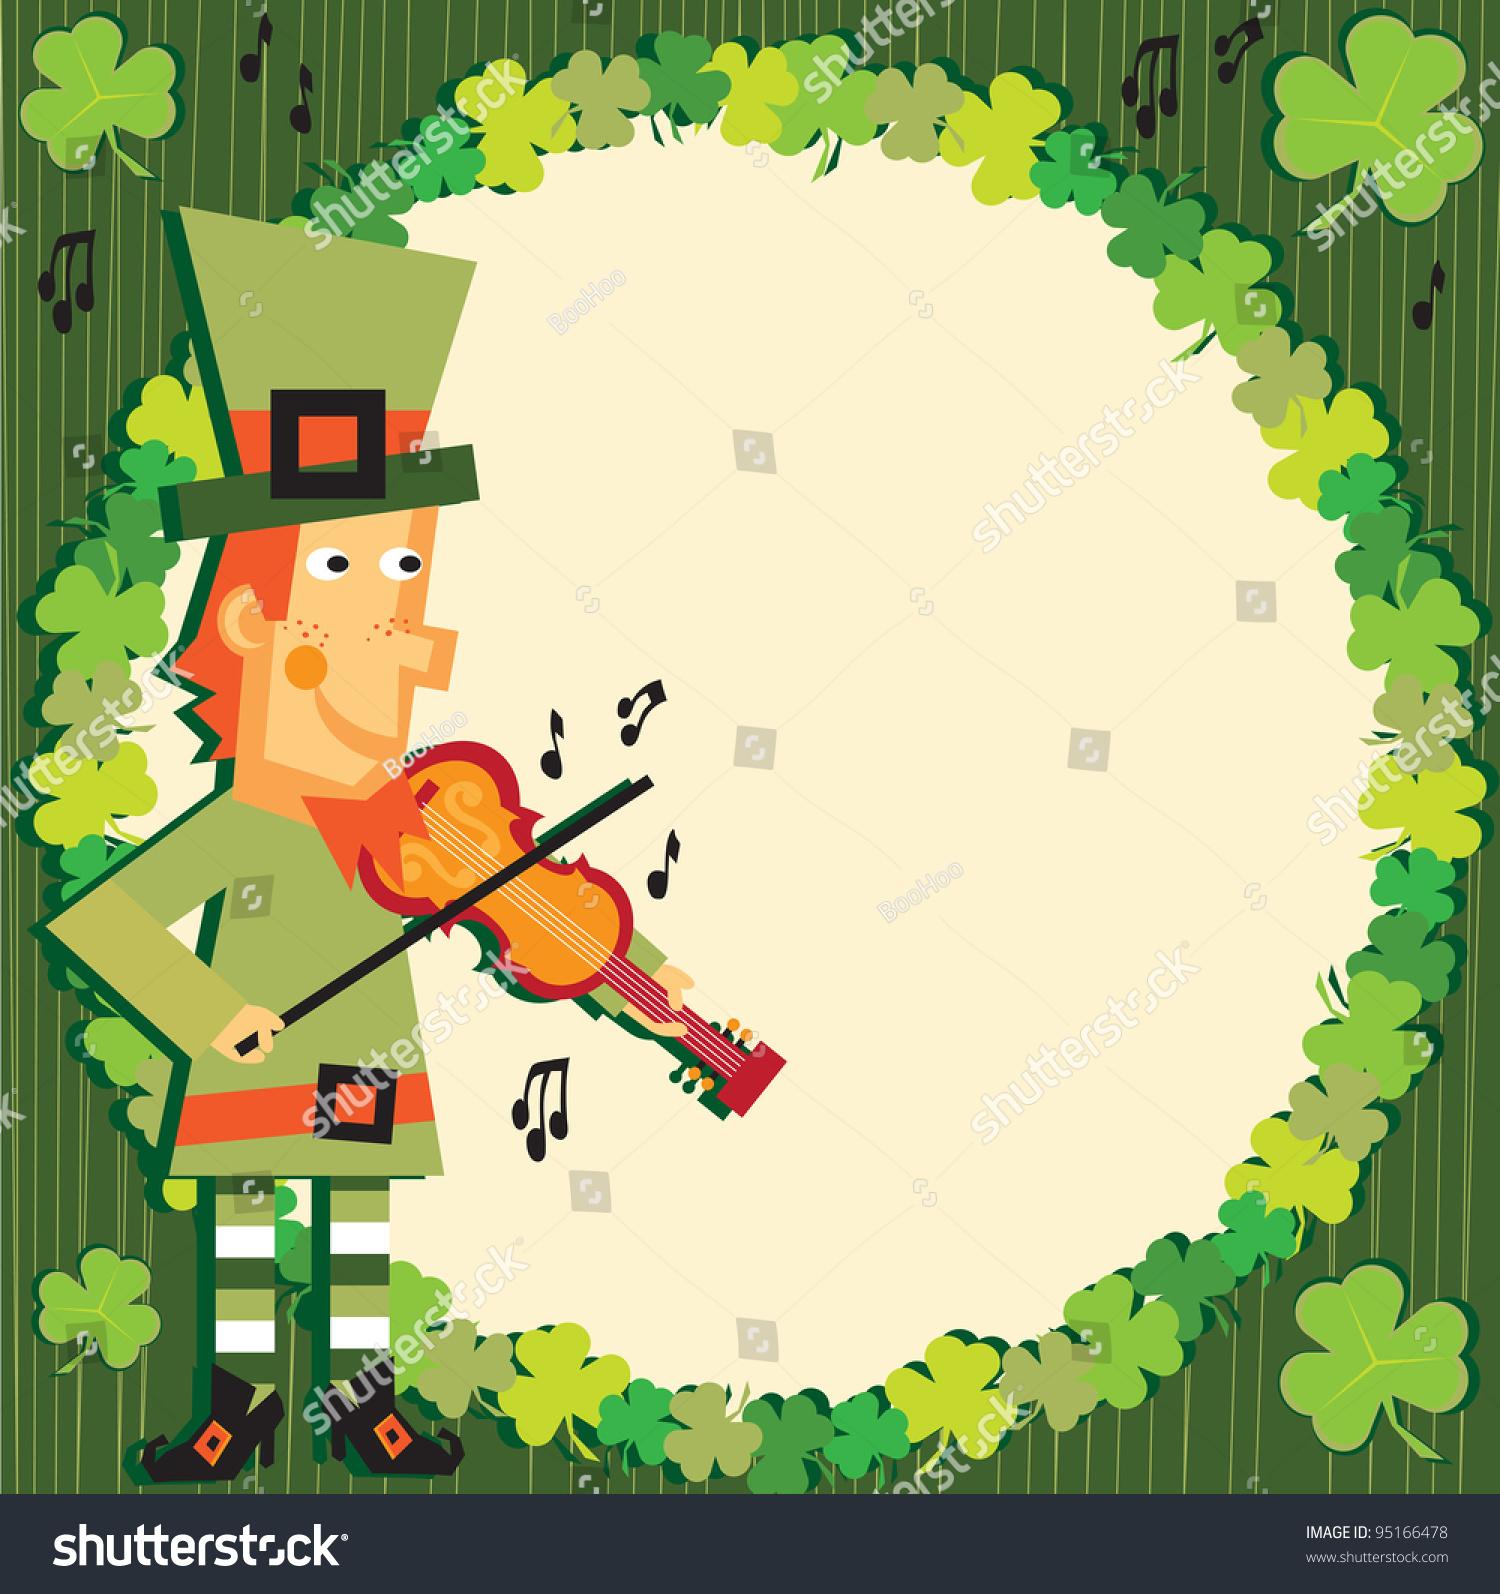 St Patricks Day Party Leprechaun Invitation Illustration – St Patricks Day Party Invitations